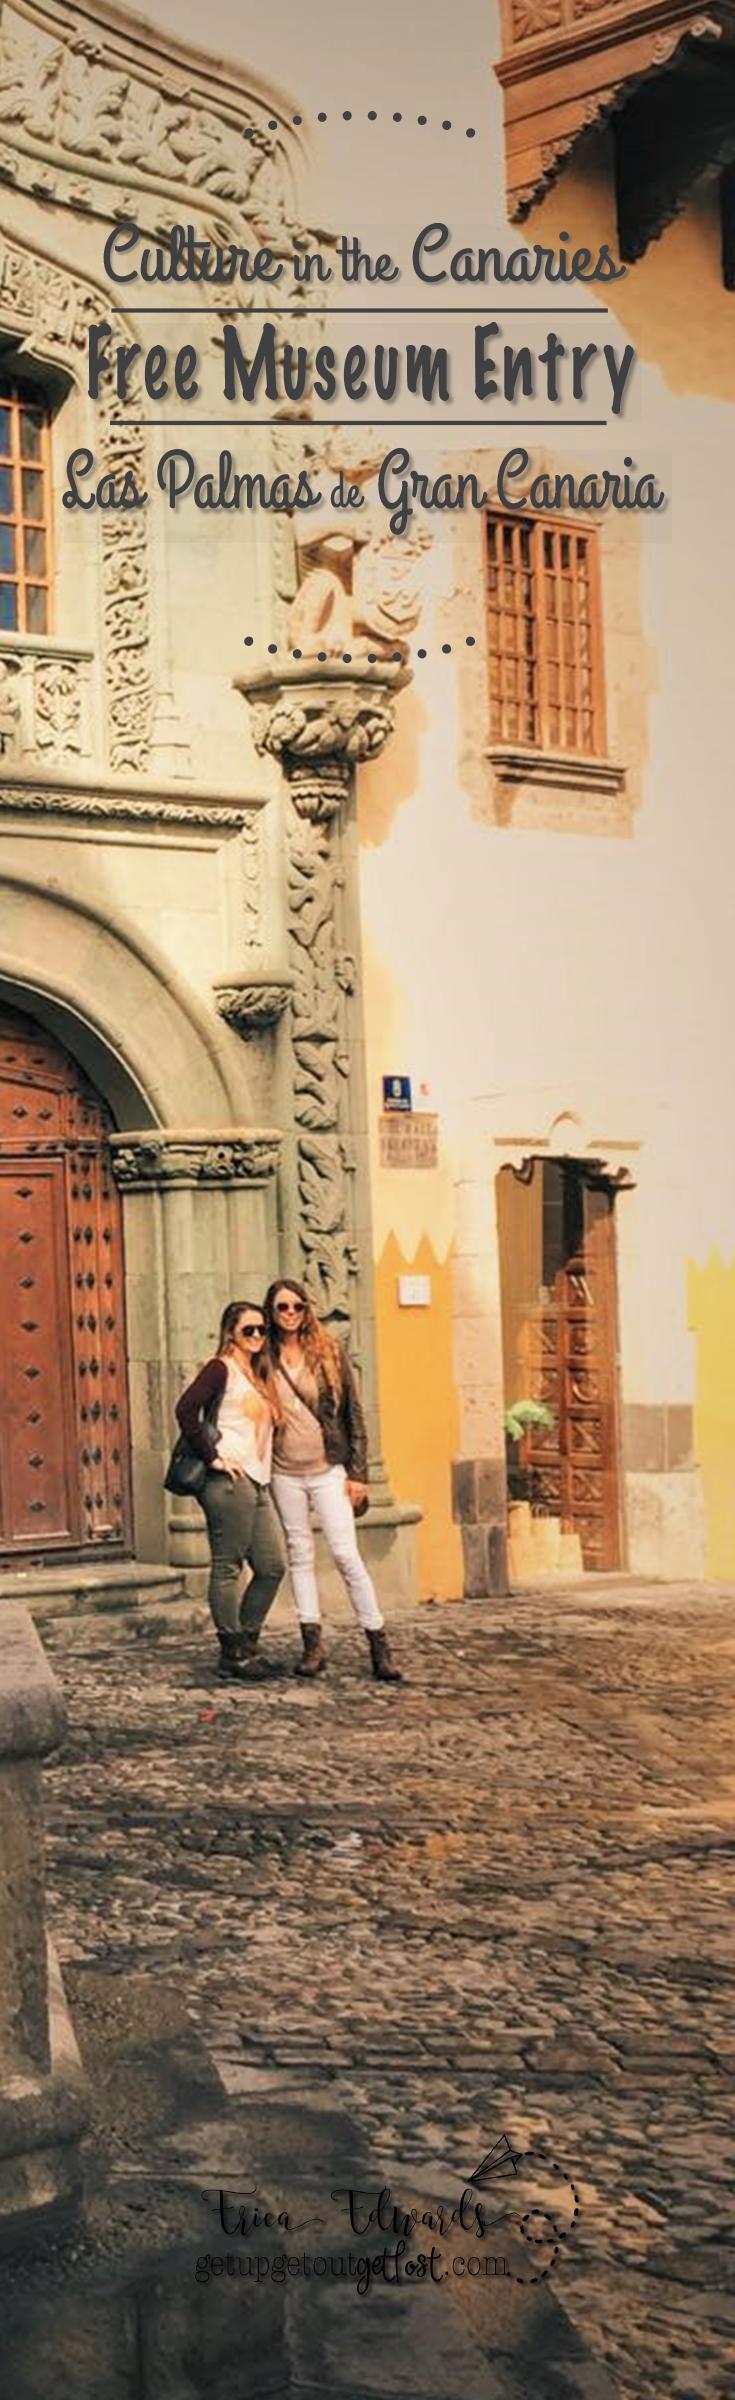 Free Museum Entry to 7 Las Palams Museums